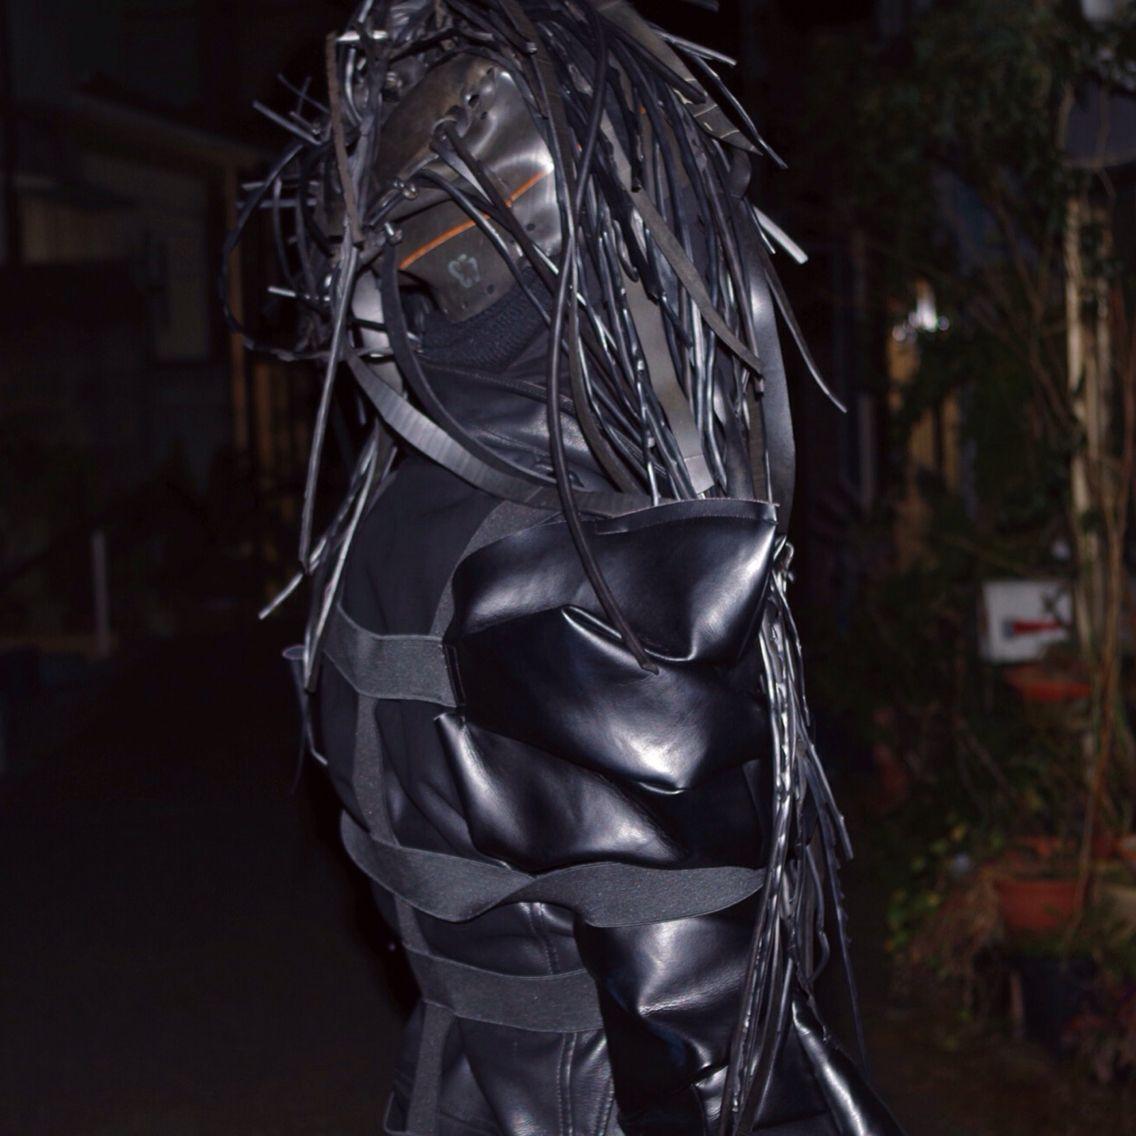 cyber avantgard fashion.  styling : kyosuke model: kyosuke photo: tochio